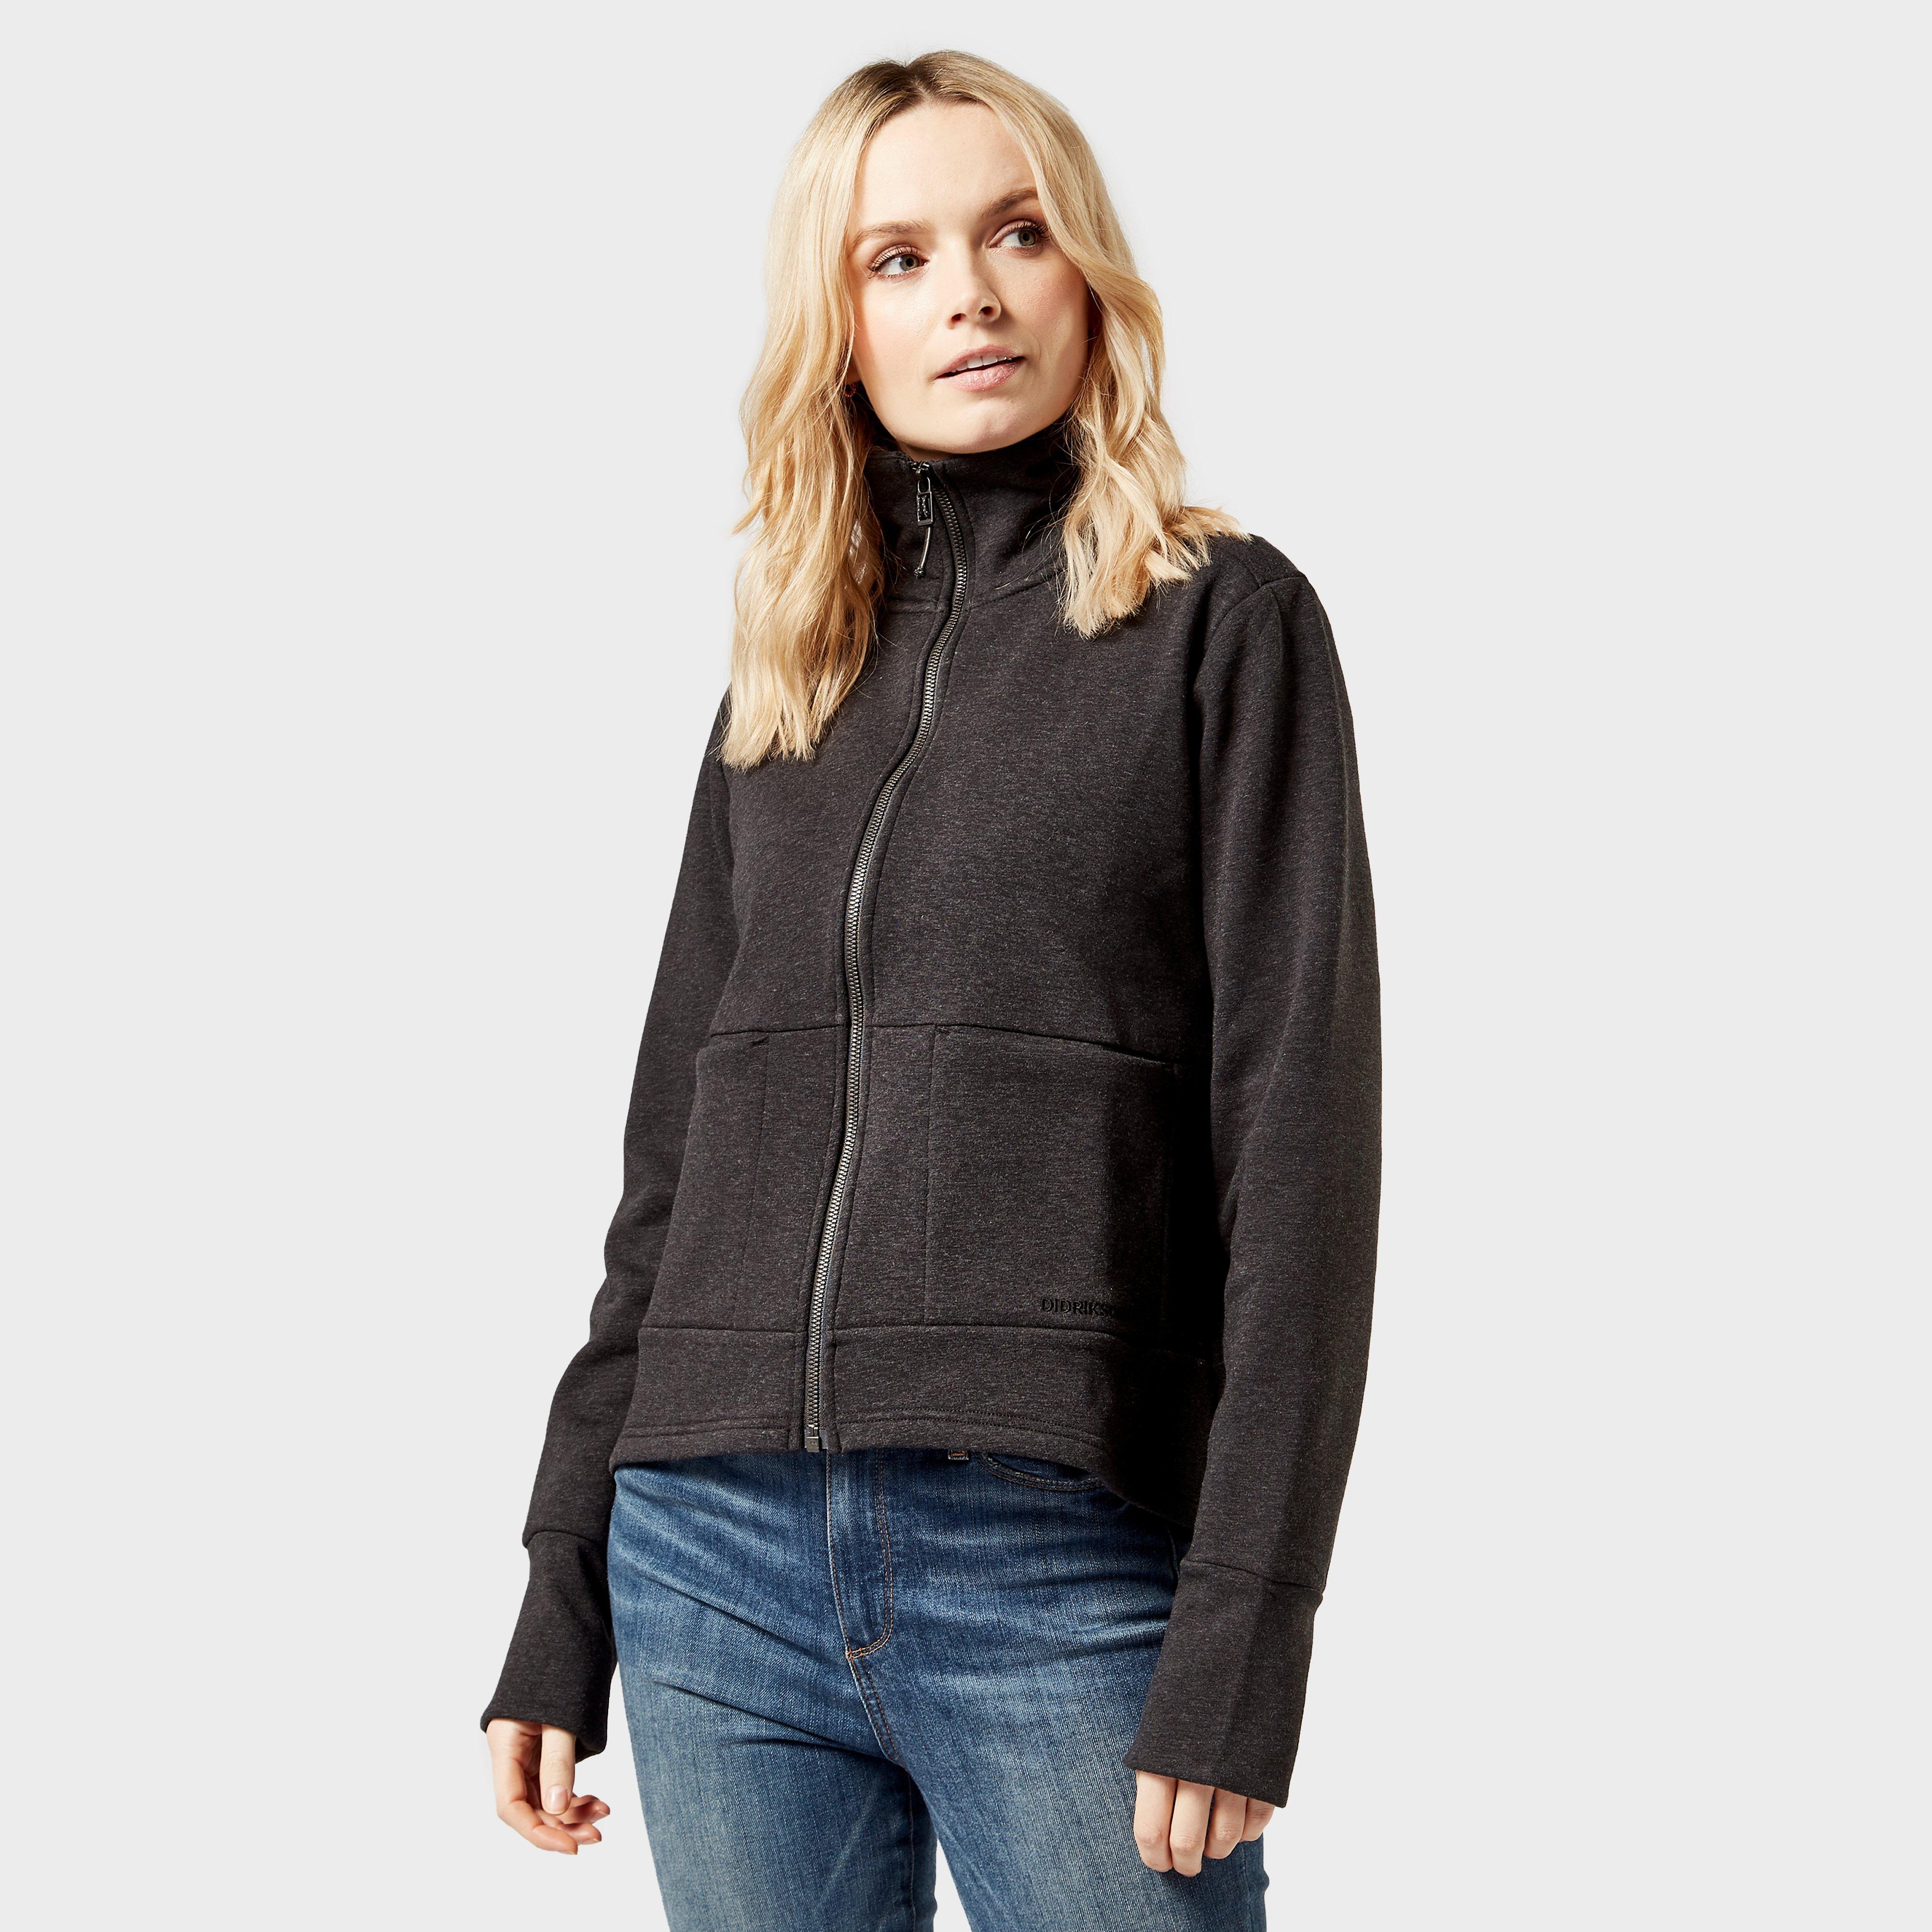 Didriksons Didriksons womens Mikaela Full-Zip Fleece - Black, Black